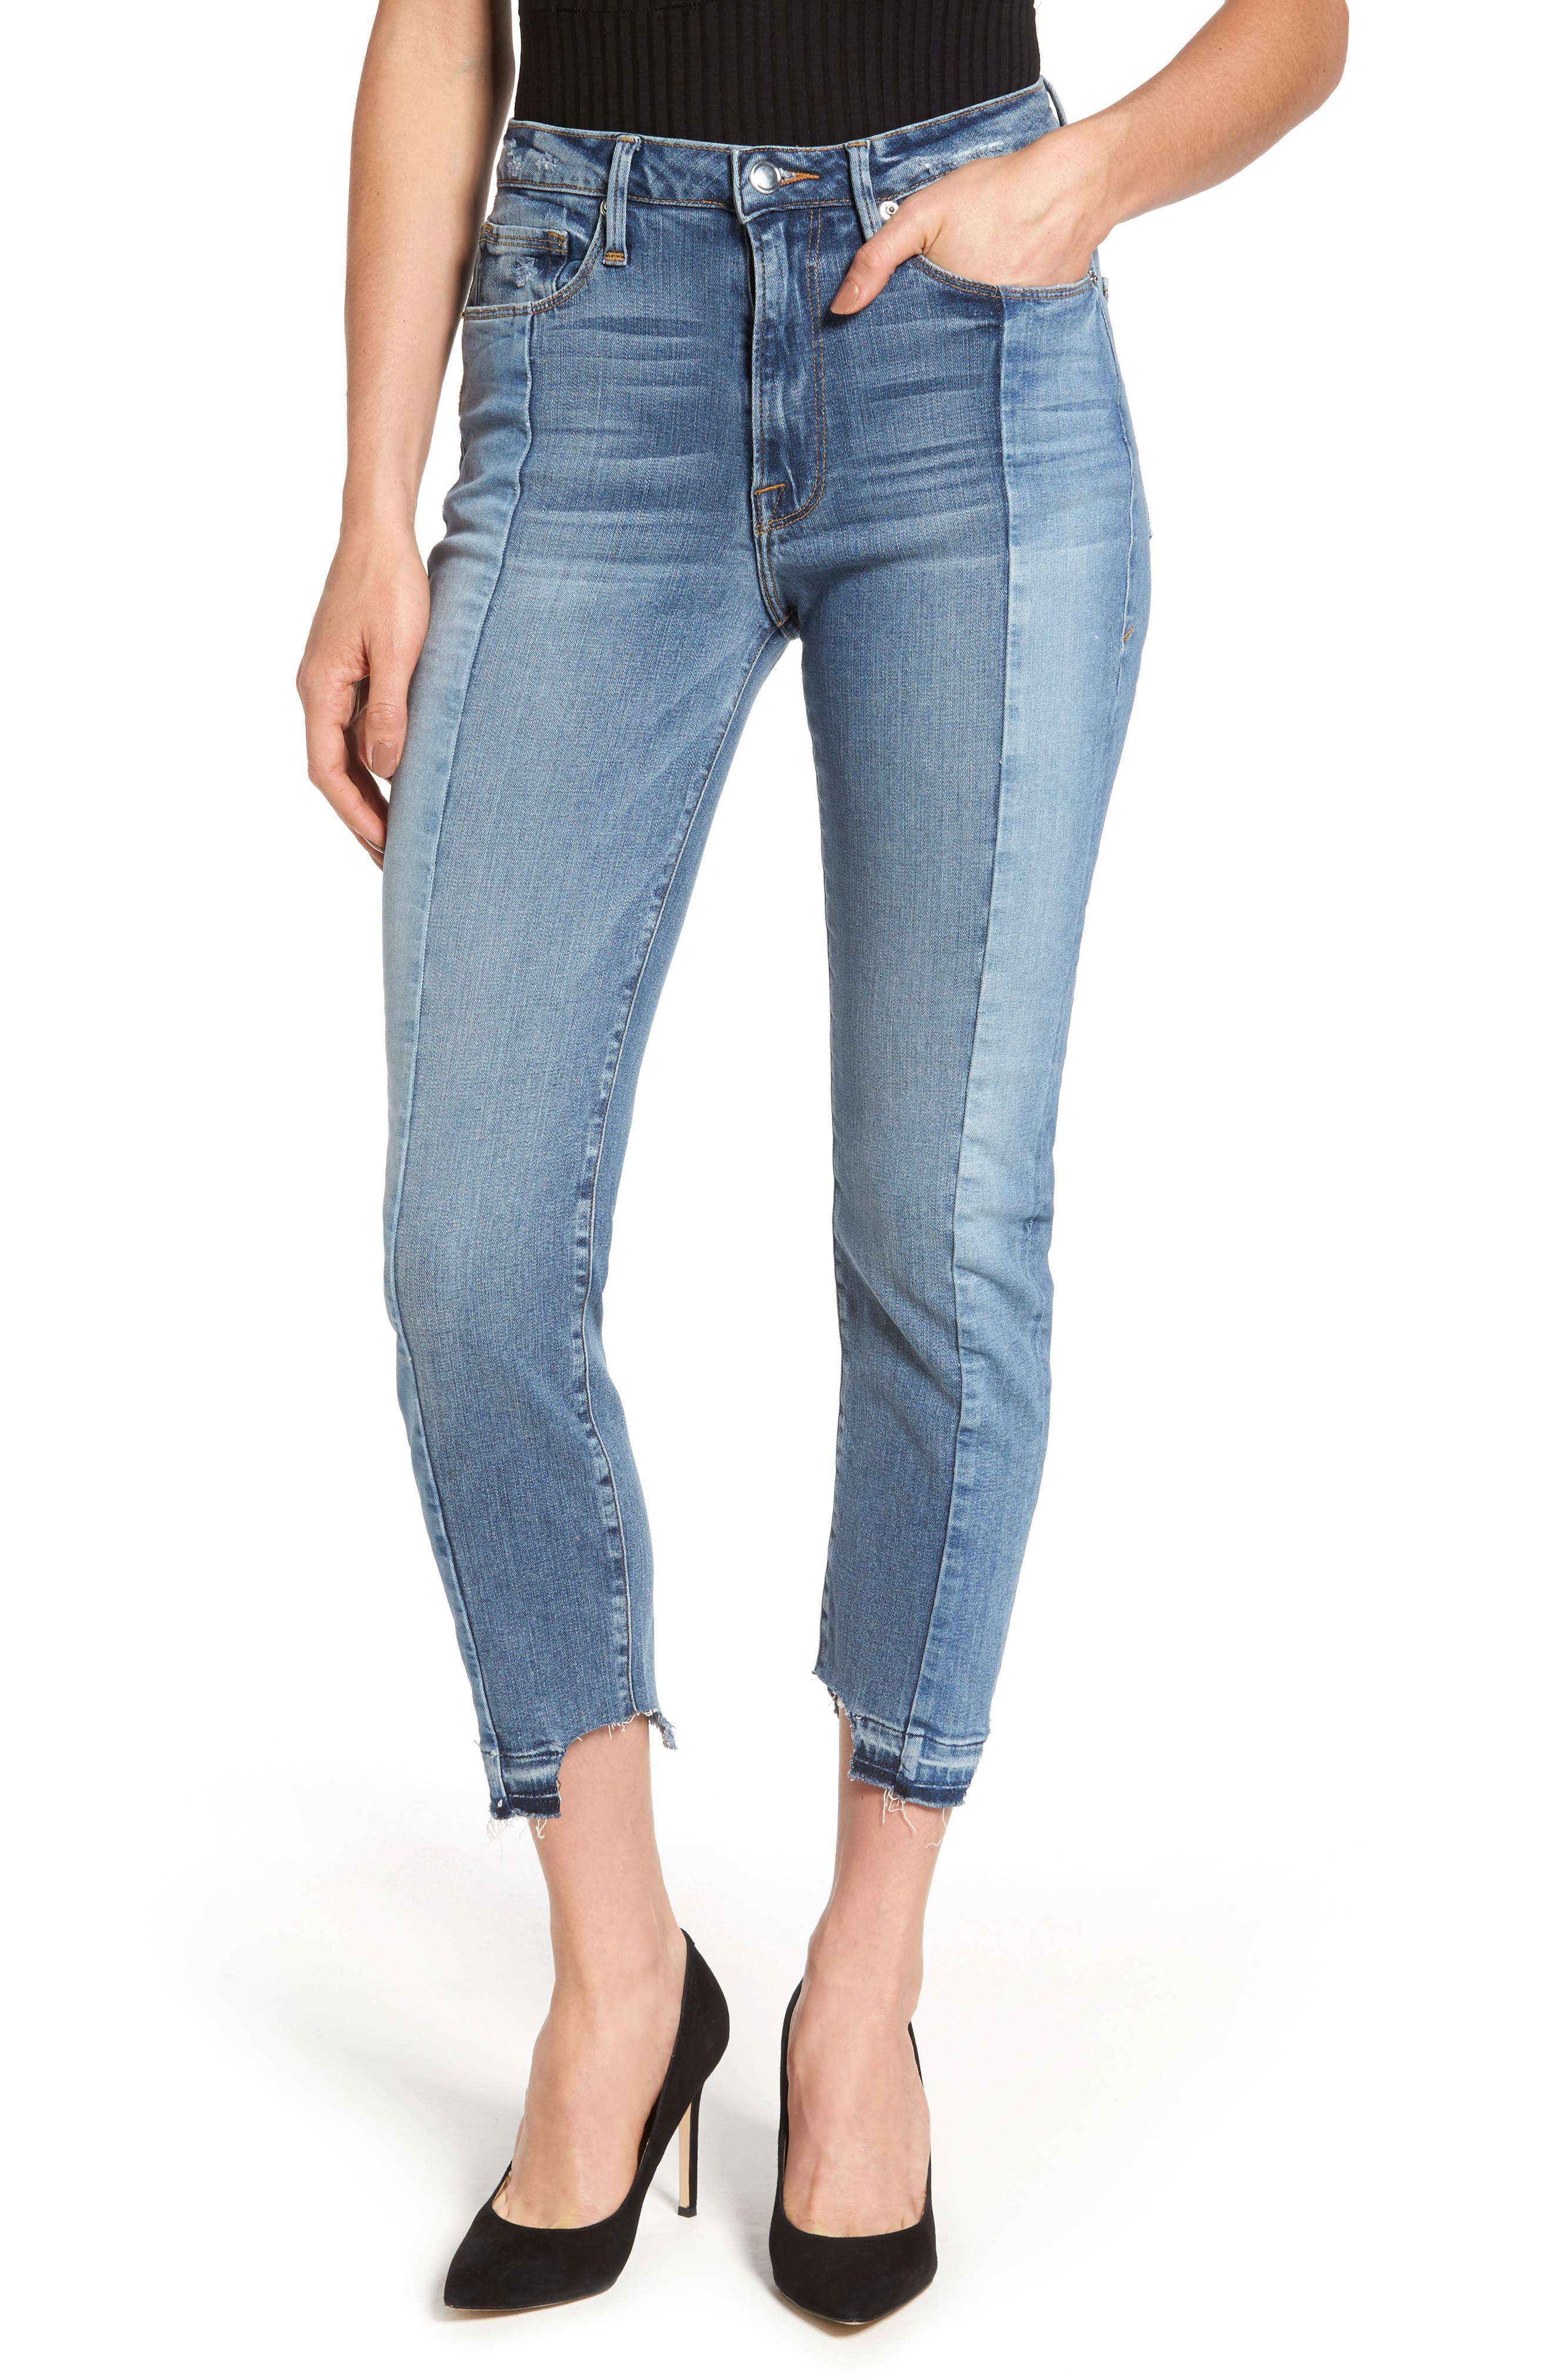 Main Image - Good American Raw Hem High Waist Skinny Jeans (Blue 078) (Extended Sizes)